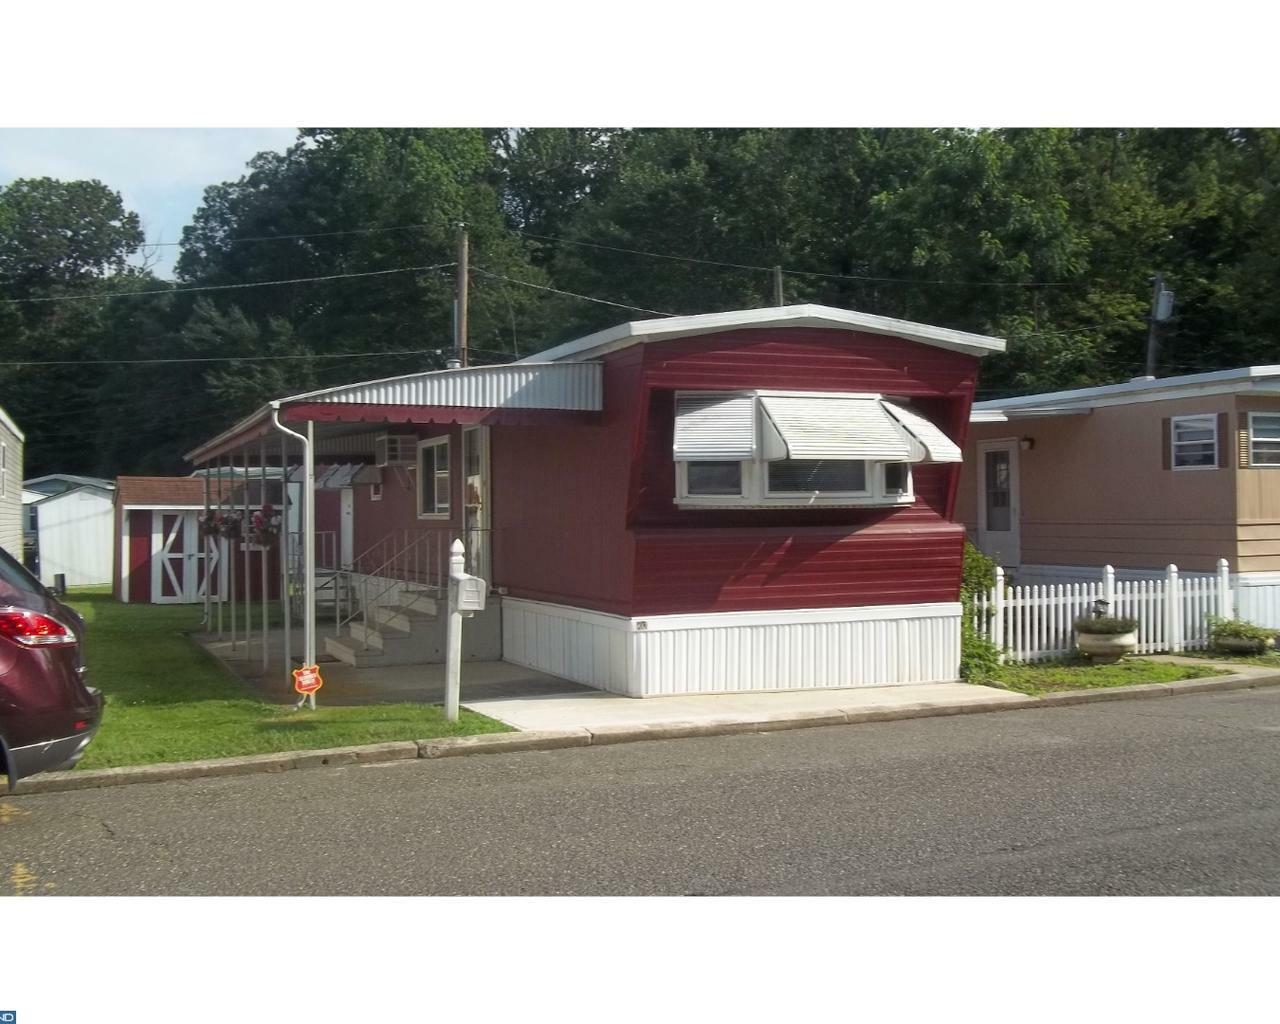 813 4th Ave, Robbinsville, NJ - USA (photo 1)